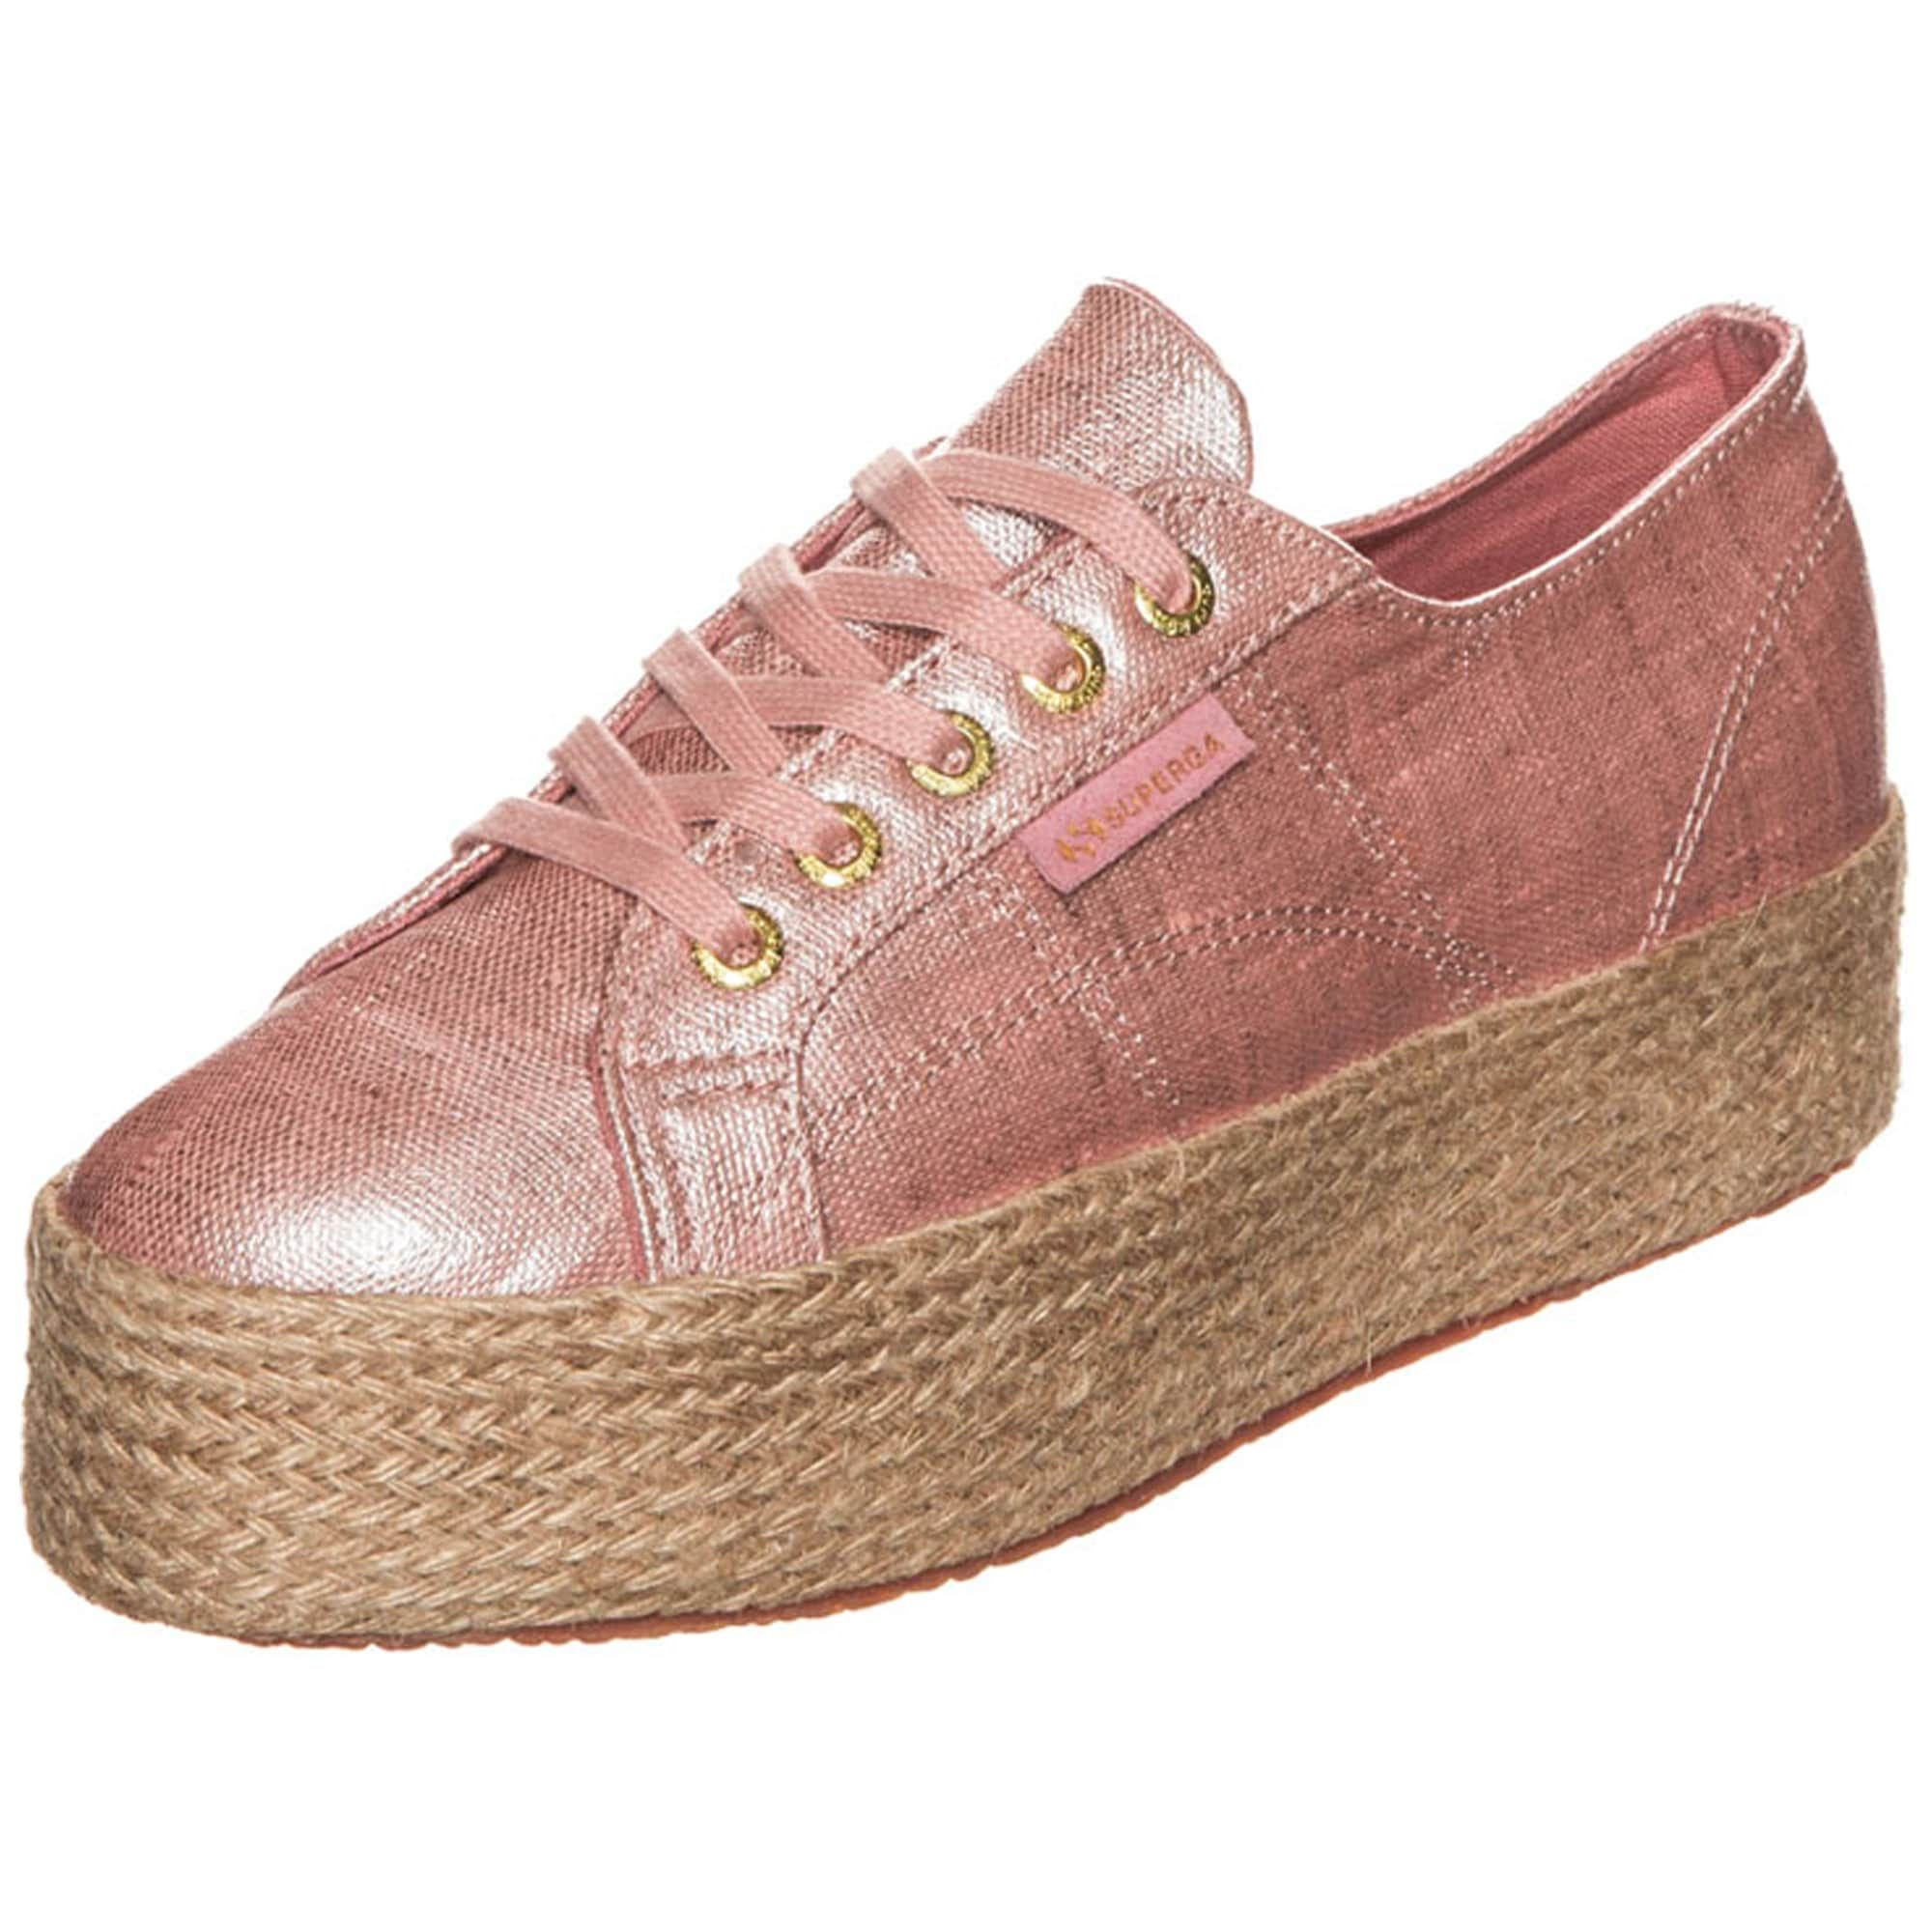 Sneaker ´2790 Linrbrropew´